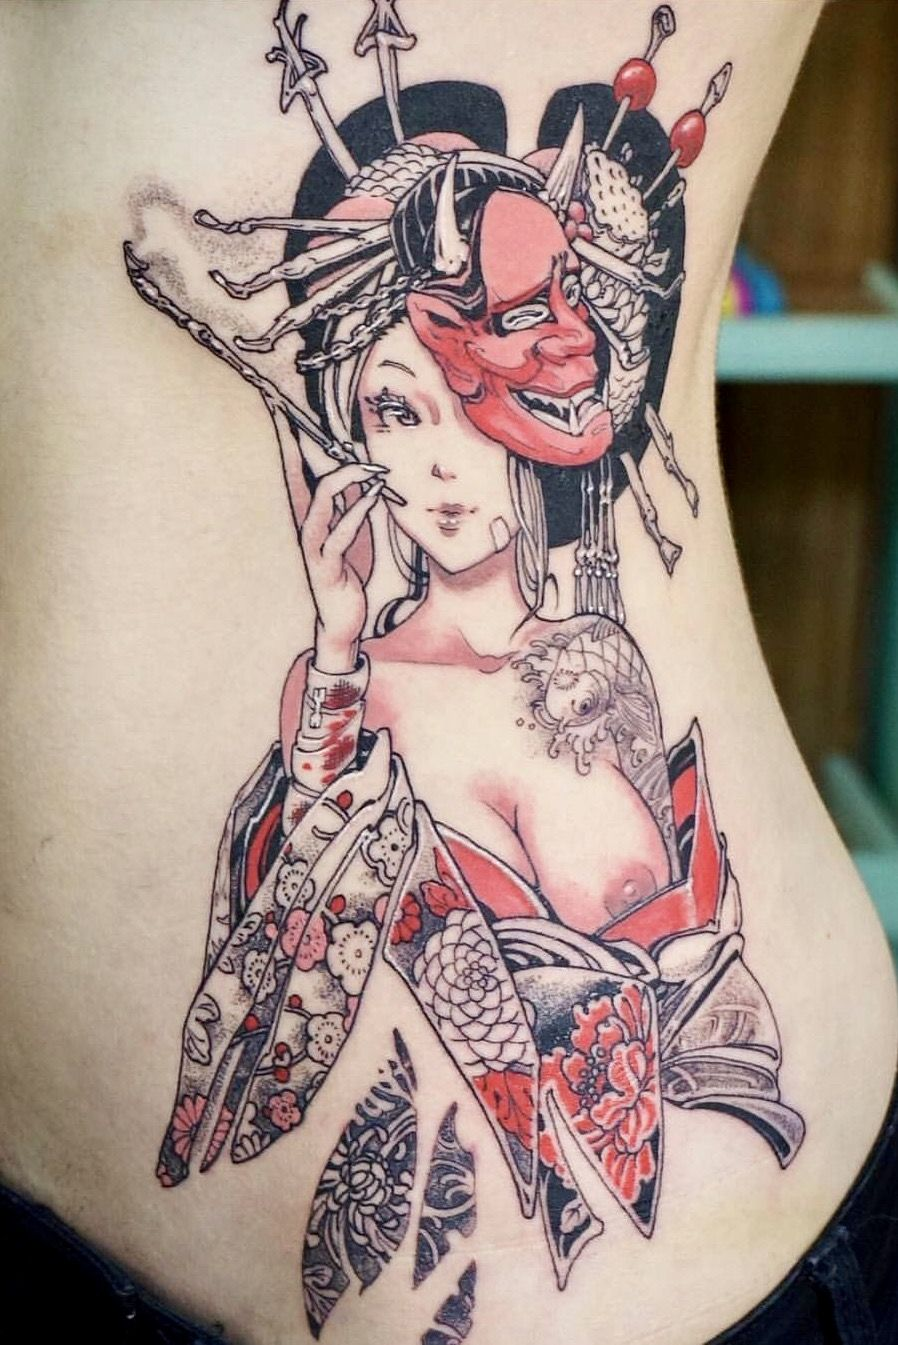 Crazy Cool Japanese Tattoo Pinup Geisha Tattoo Design Tattoos Japanese Girl Tattoo